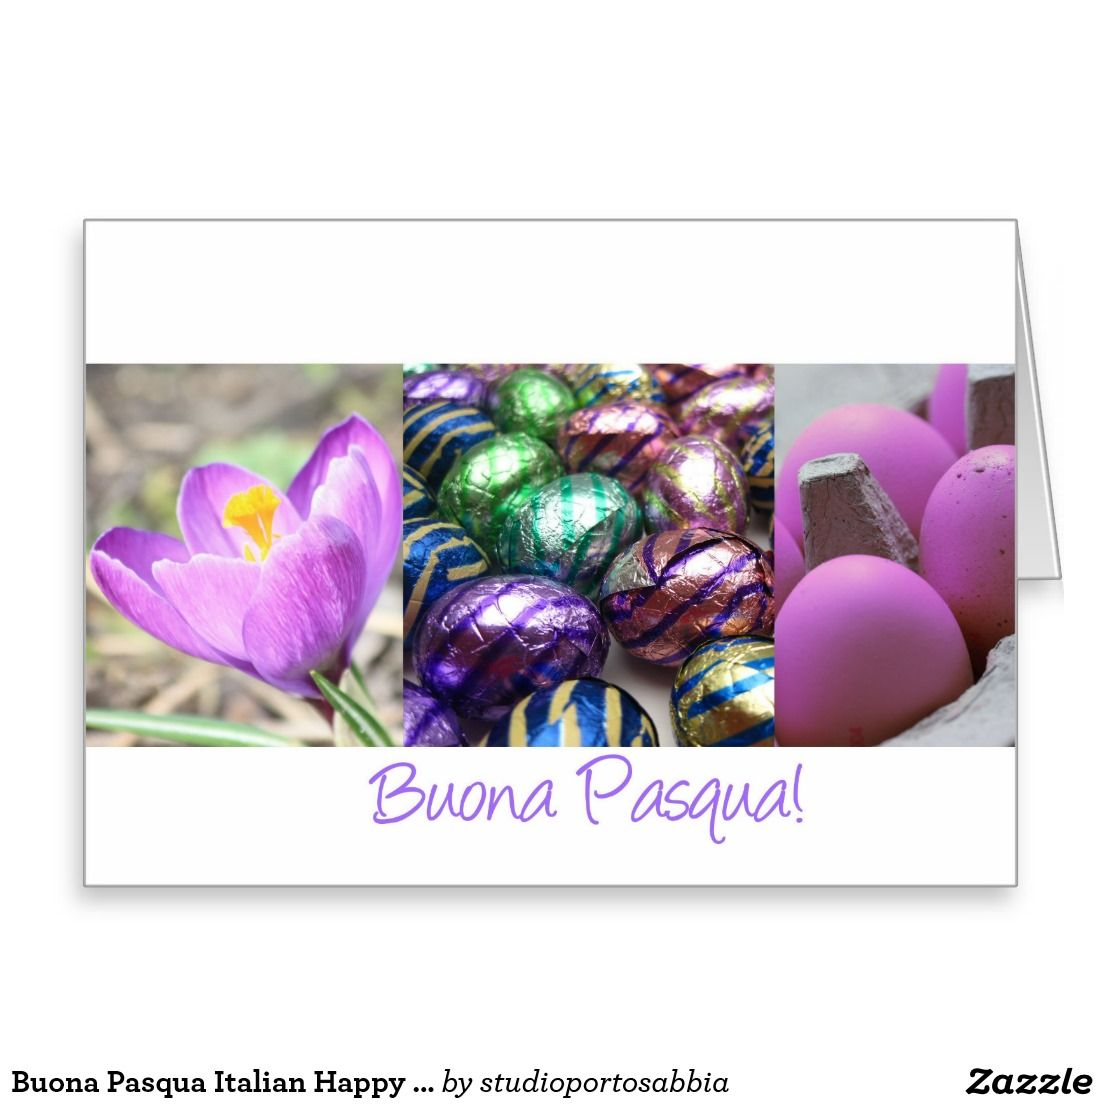 Buona Pasqua Italian Happy Easter Greeting Card Stuff Sold On